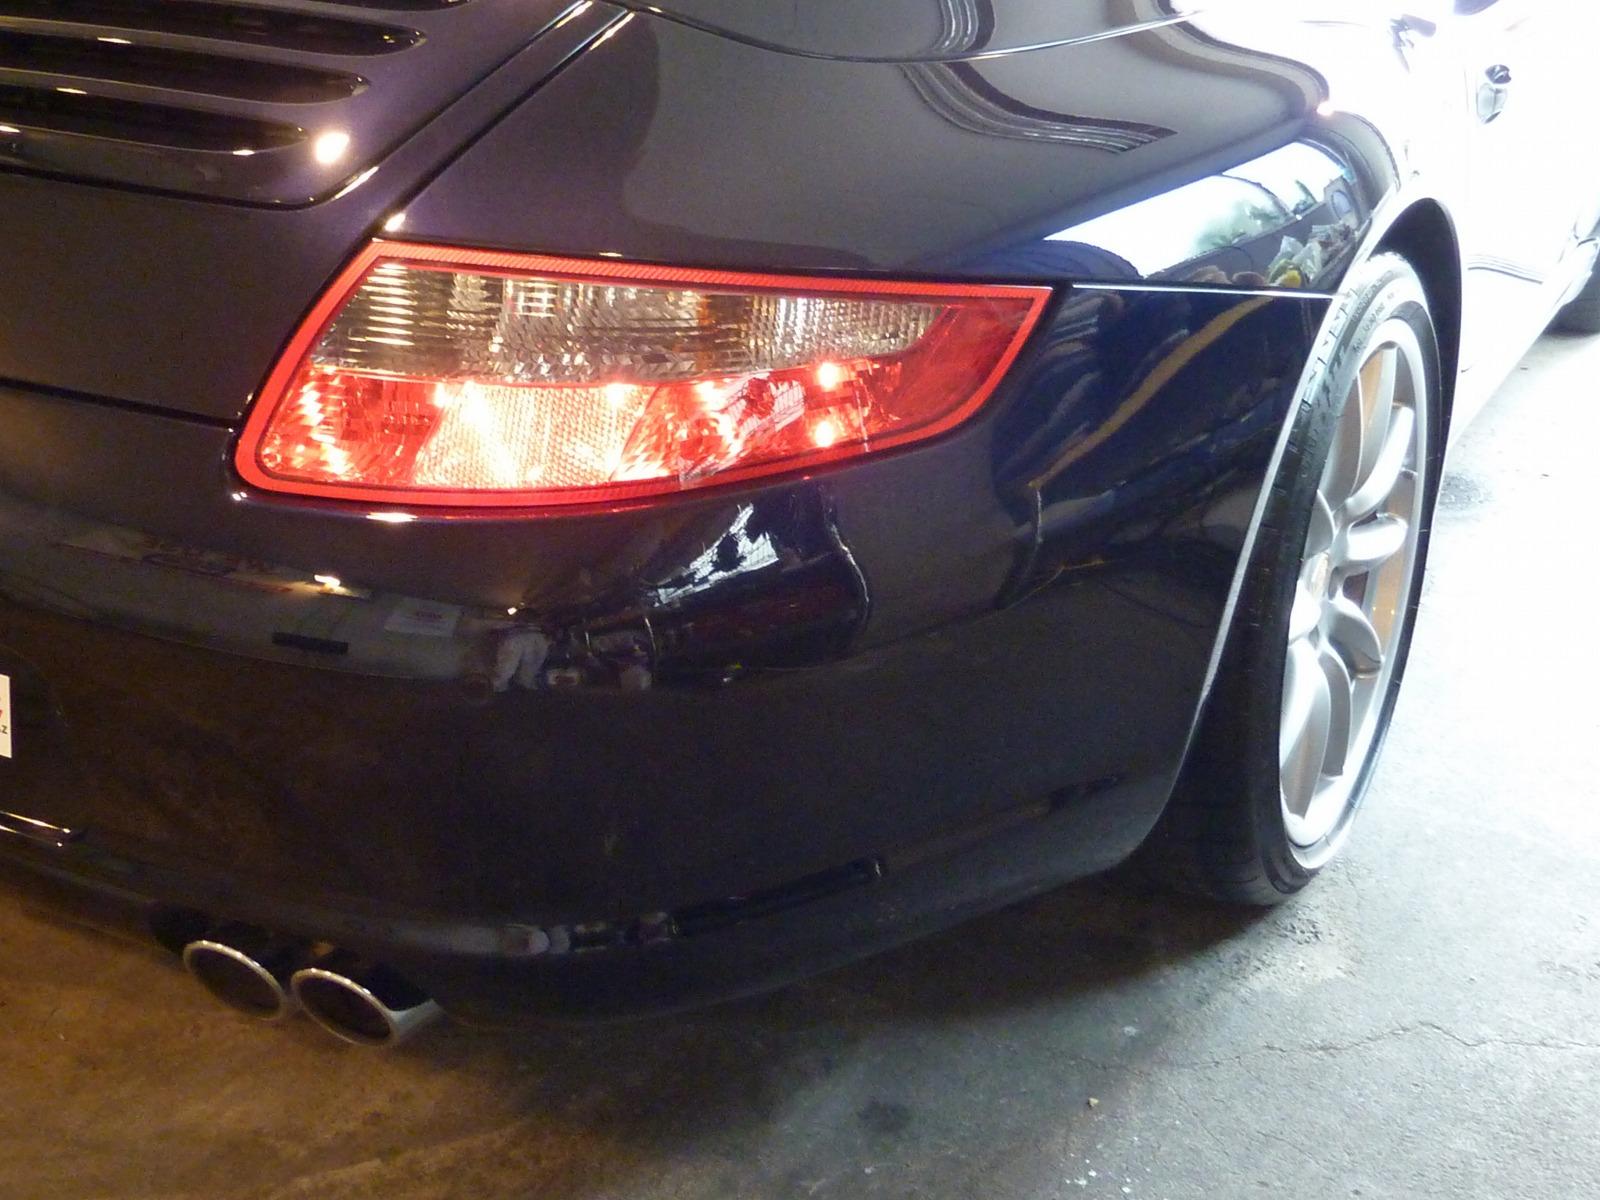 20130405-porshe-911-carrera-4s-cabriolet-08